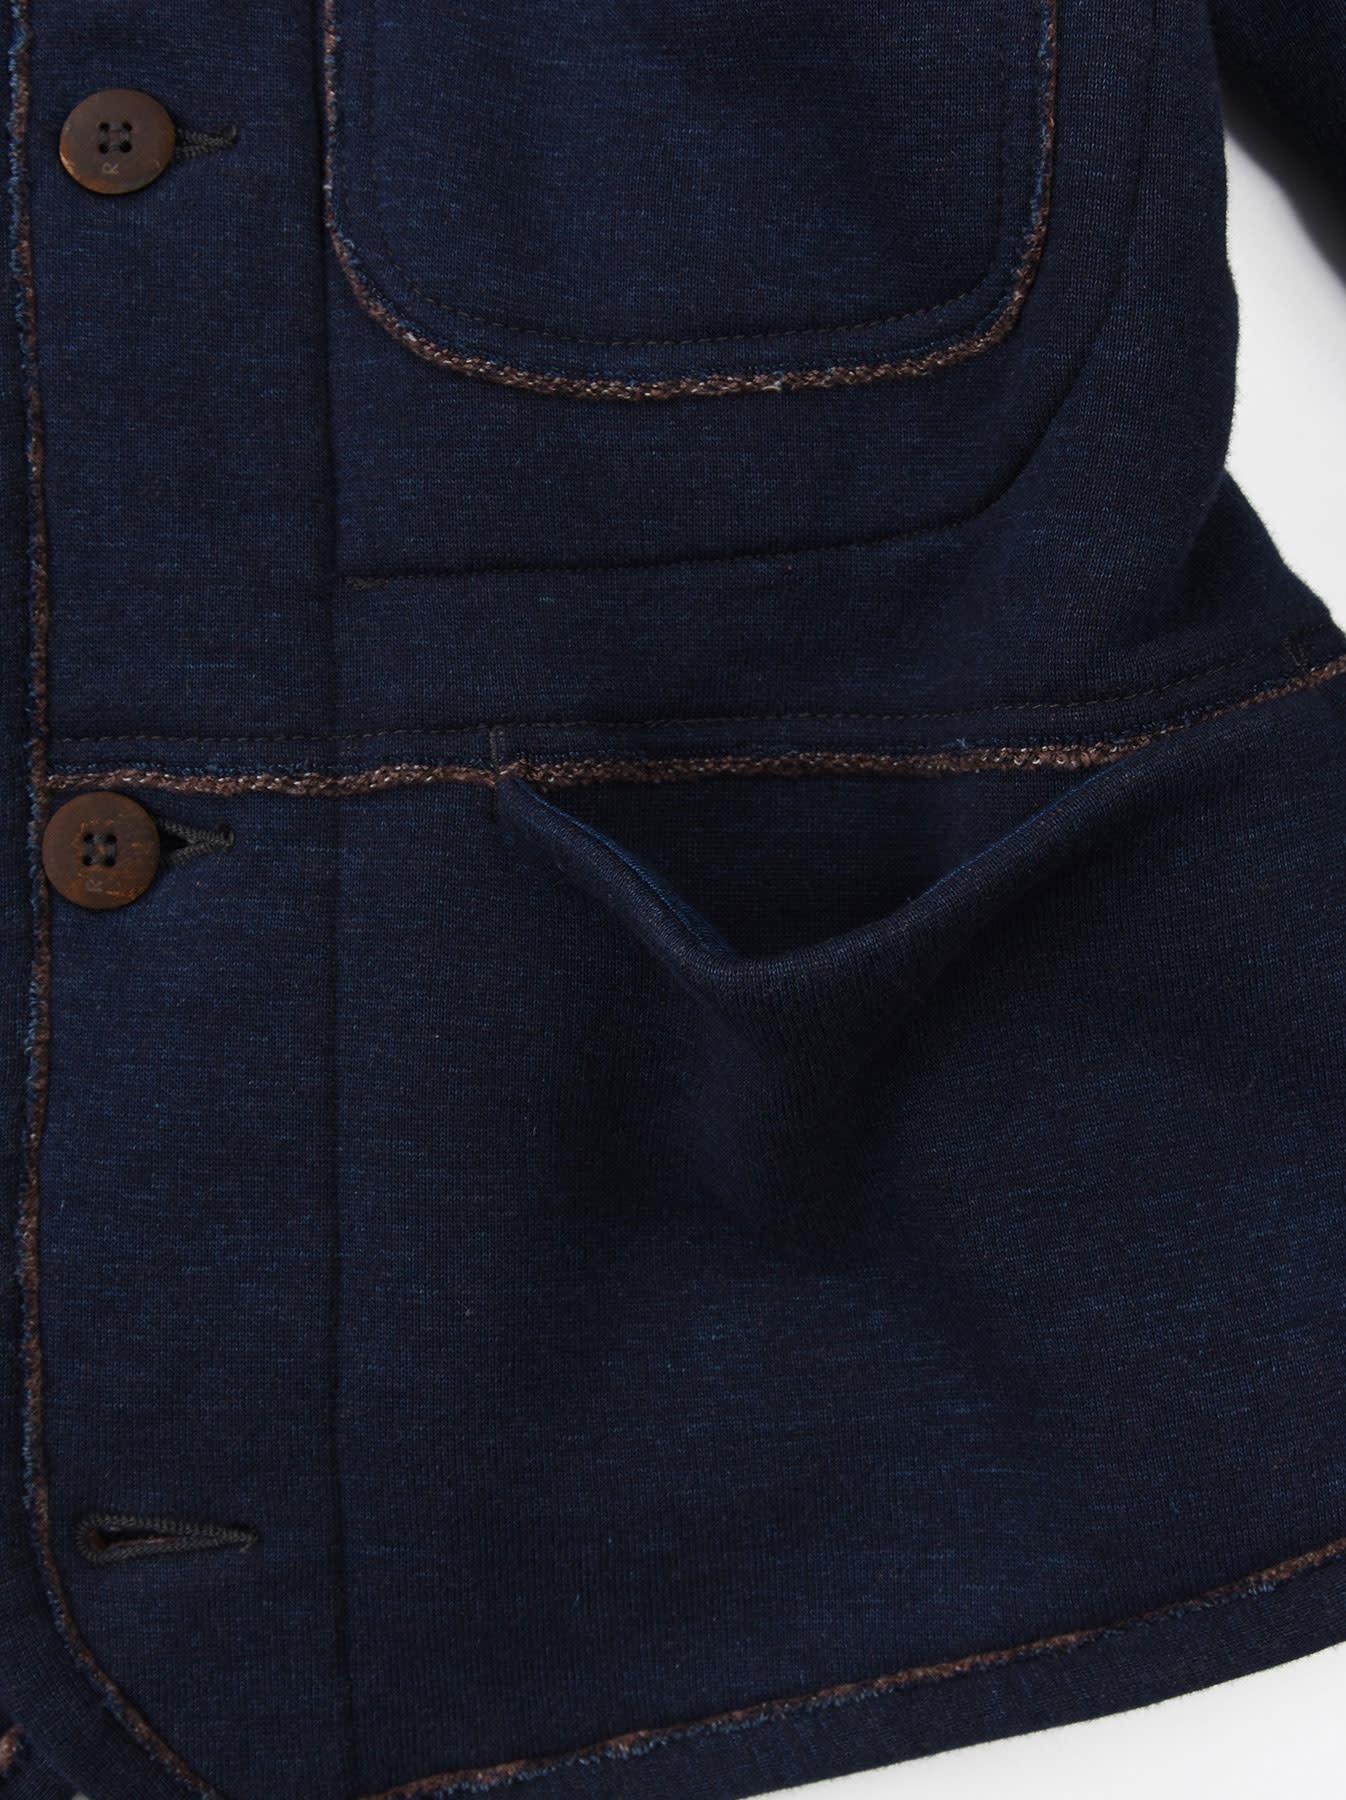 Indigo Hokkaido Fleecy Liner Cardigan-10